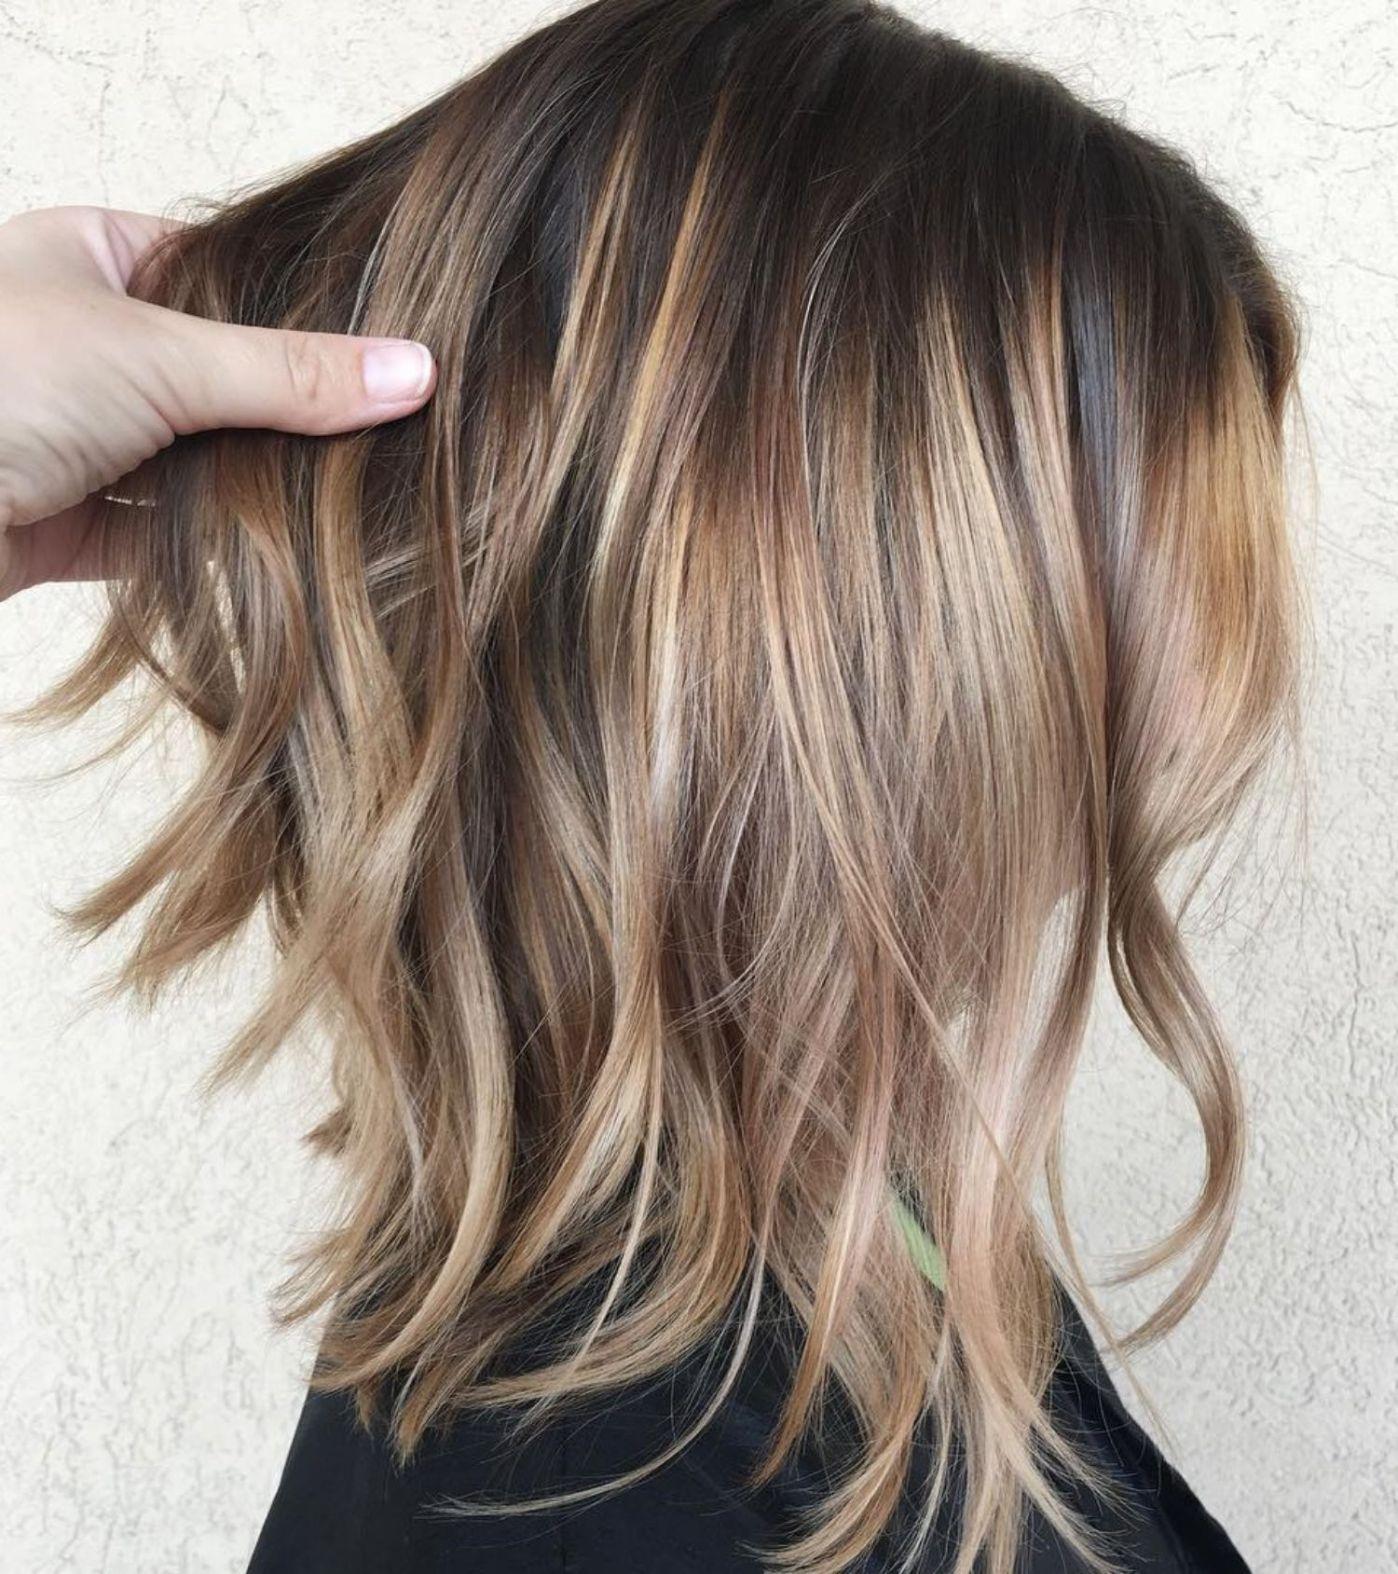 70 perfect medium length hairstyles for thin hair | hair in